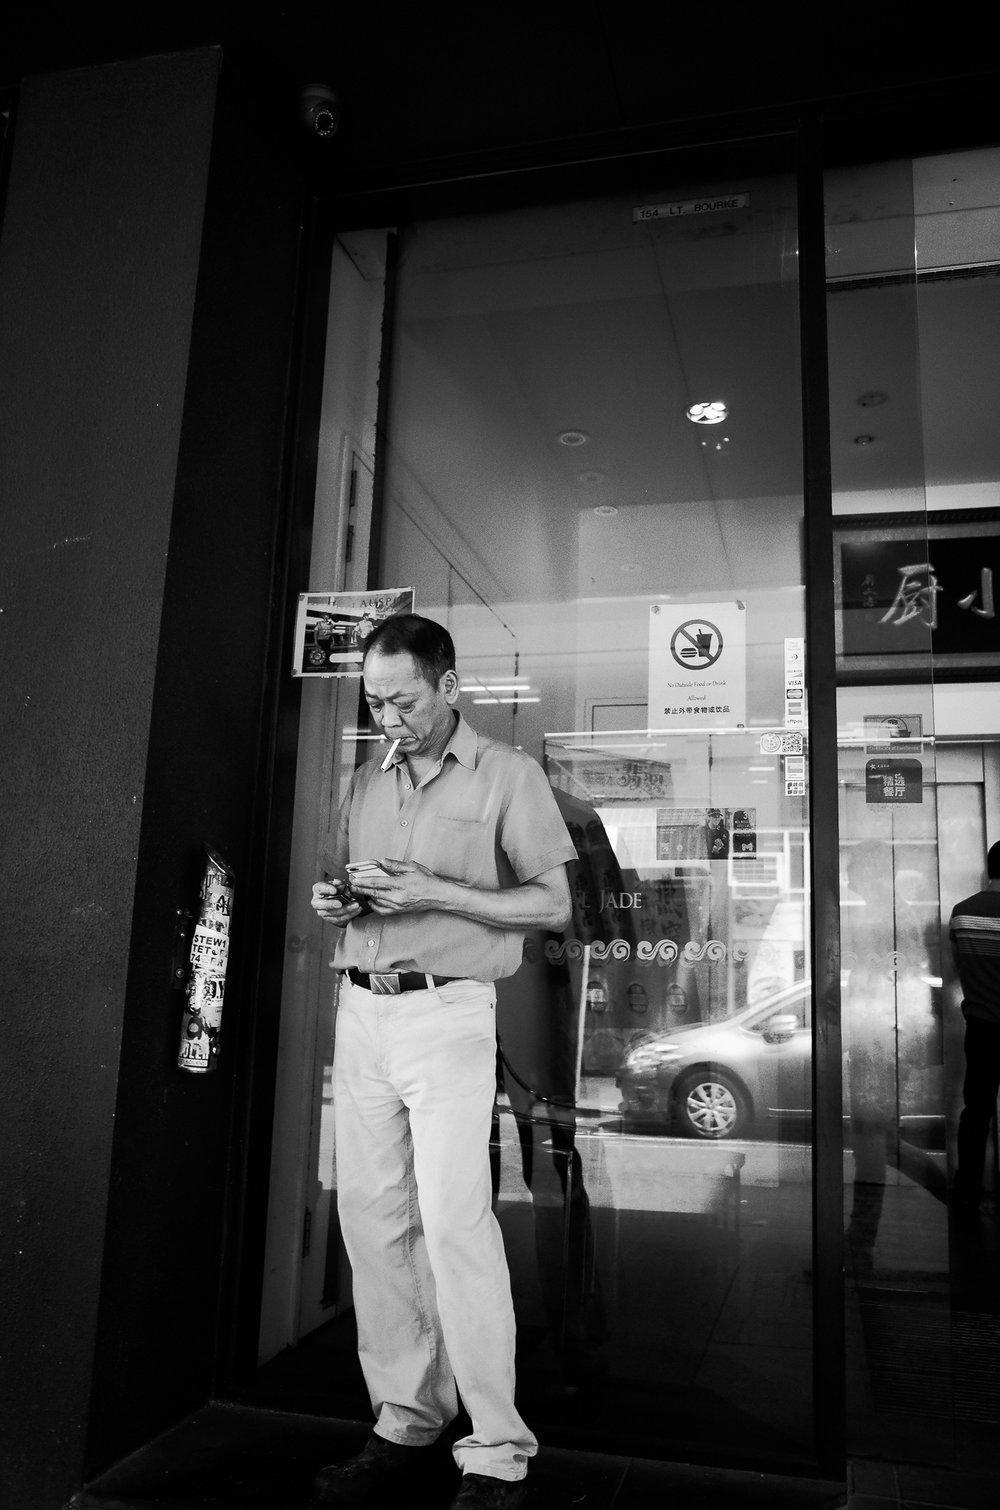 #street #streetstyle #streetphotography #streetart #streetwear #streetfashion #streetdreamsmag #streetphoto #streets #streetlife #streetworkout #streetfood #wallstreet #streetarteverywhere #streetartistry #streetphotographer #streetview #superstreet #MenWithStreetStyle #streetbike #streetshot #urbanandstreet #streetwearfashion #streetlook #streetfighter #streetphotographers #streetartist #streetmobs #streetracing #streetmagazine